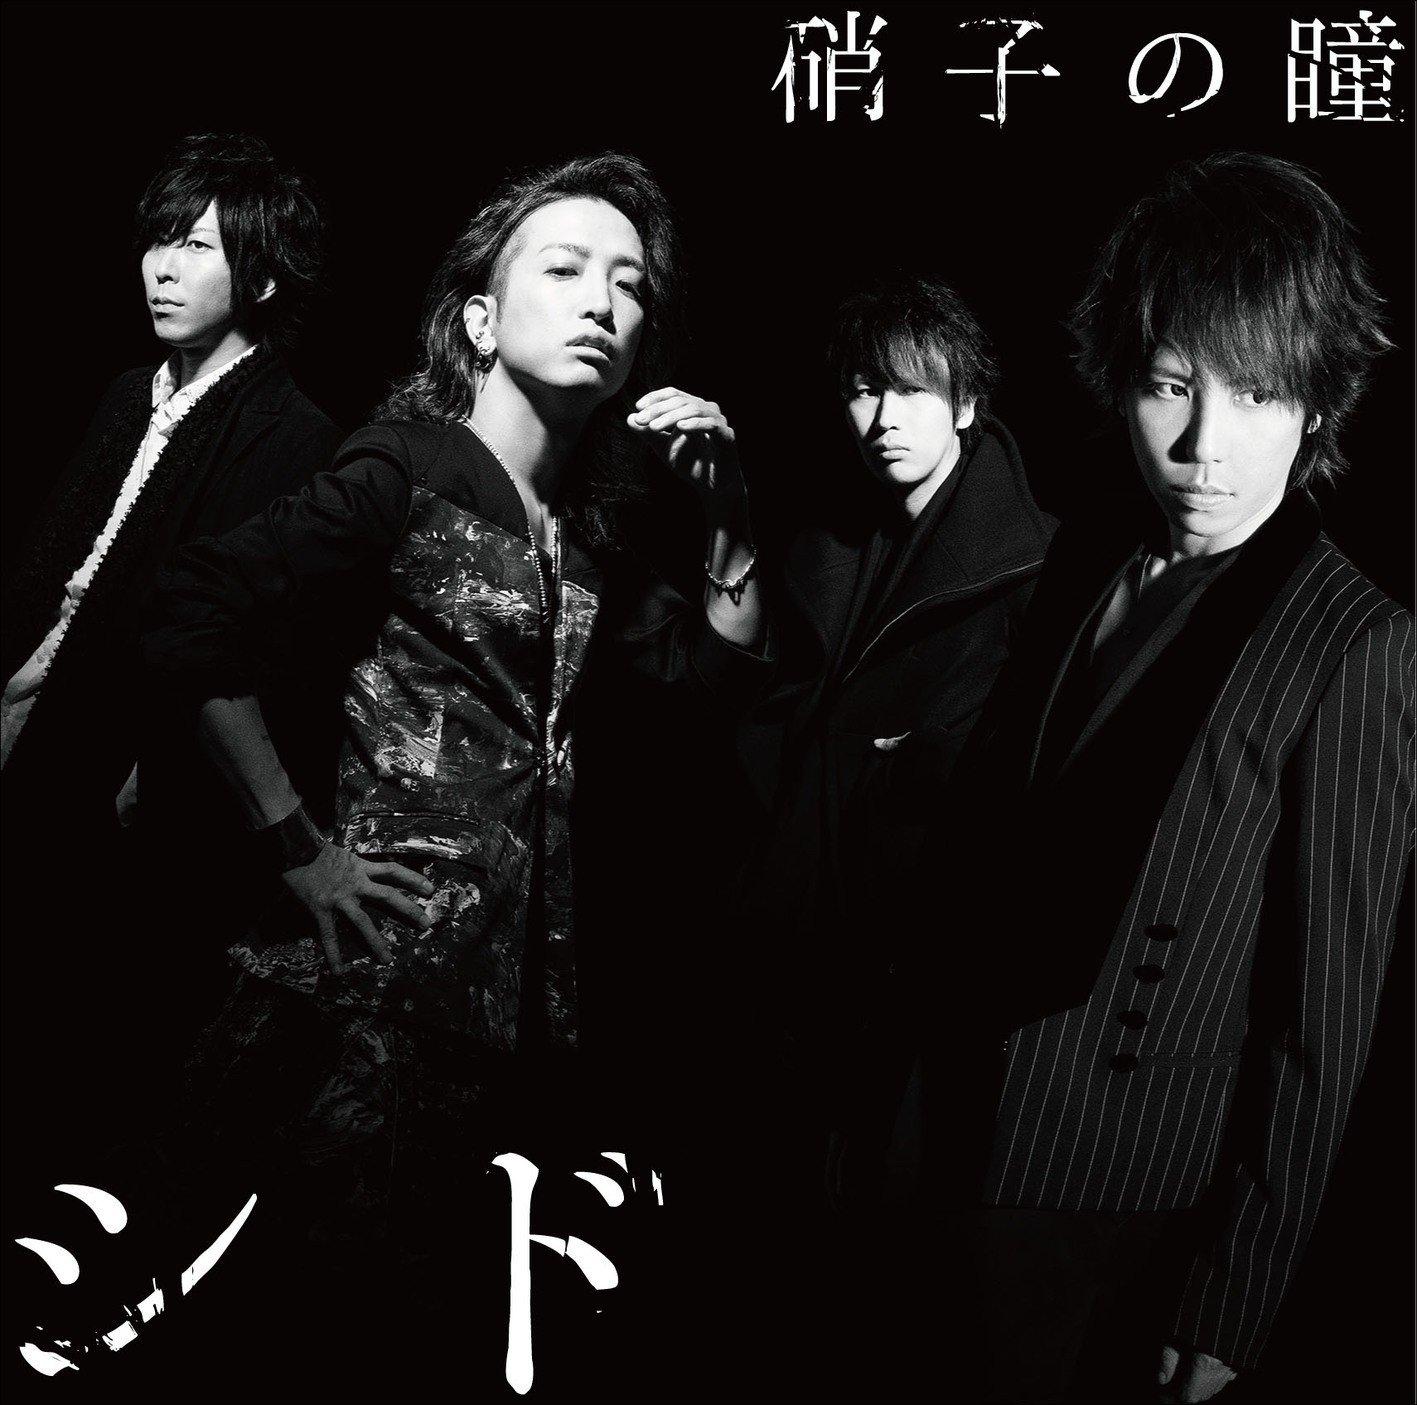 [Album] シド (SID) – 硝子の瞳-Special Edition- [FLAC / 24bit Lossless / WEB] [2017.01.18]